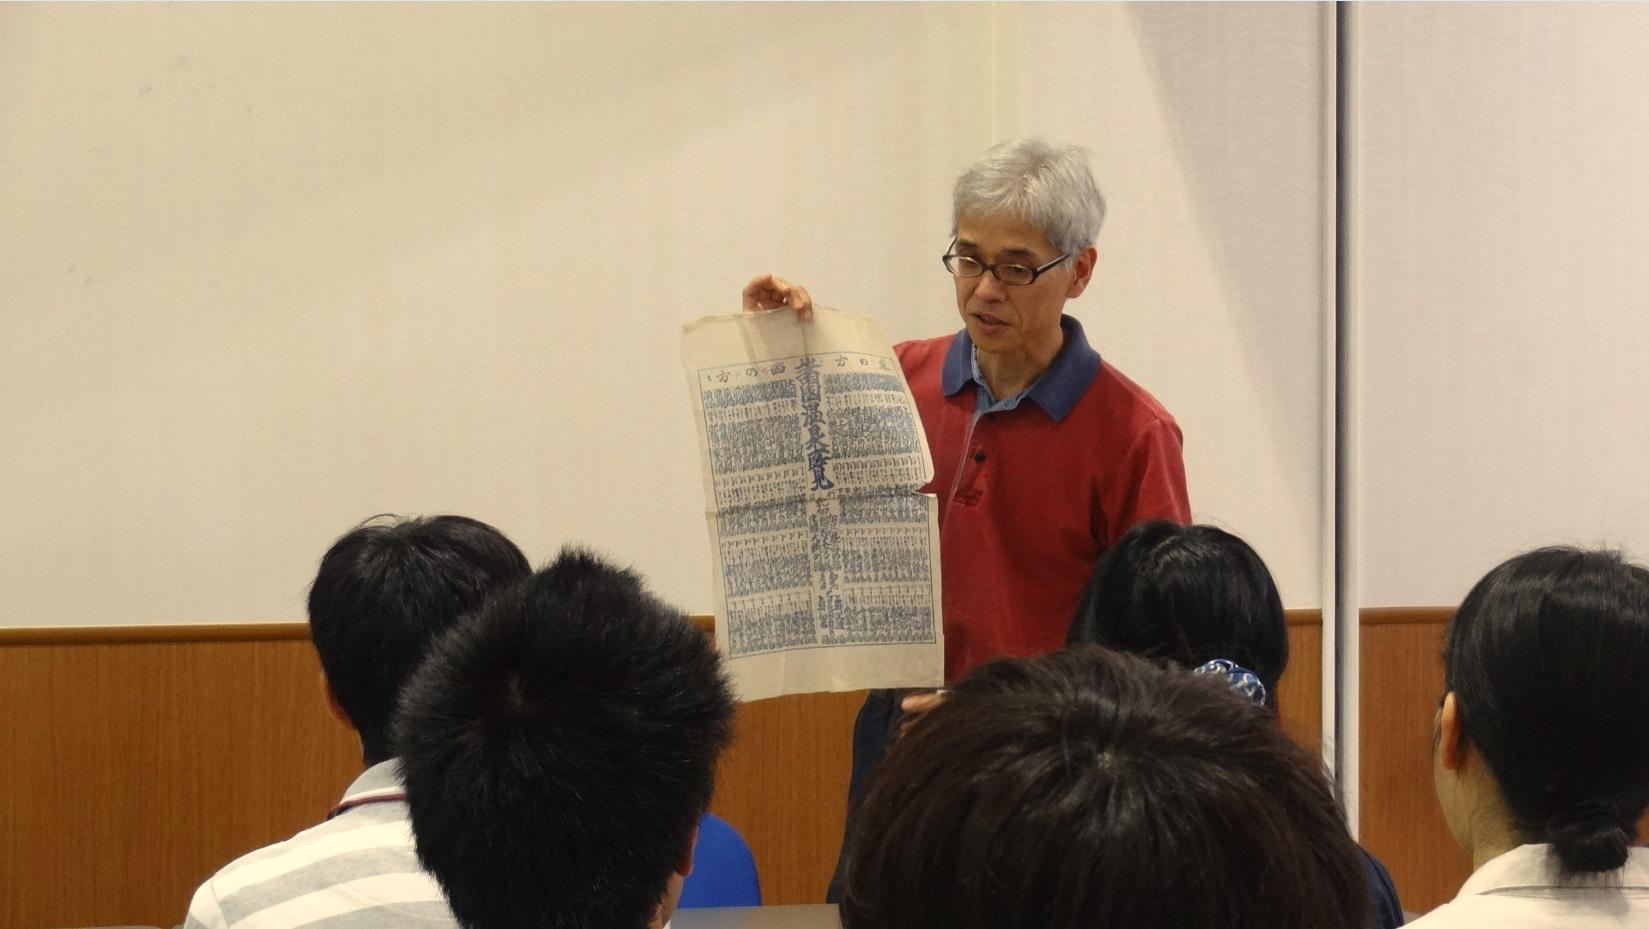 http://www.shinshu-u.ac.jp/institution/library/matsumoto/1f2cf24f6bd8d7c9bf9a729f363947ef_1.jpg